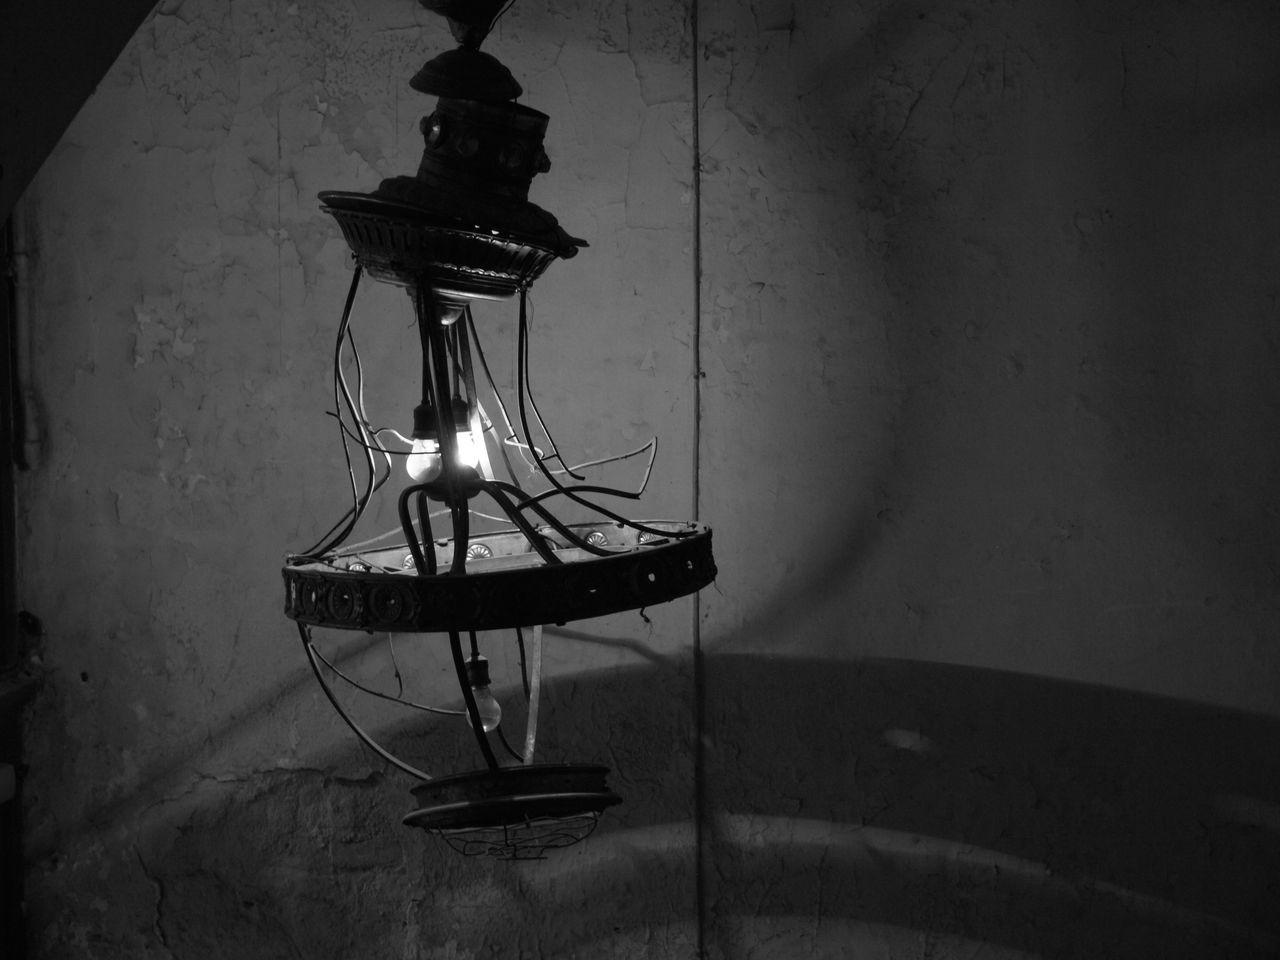 Damaged Illuminated Light Bulb Against Wall